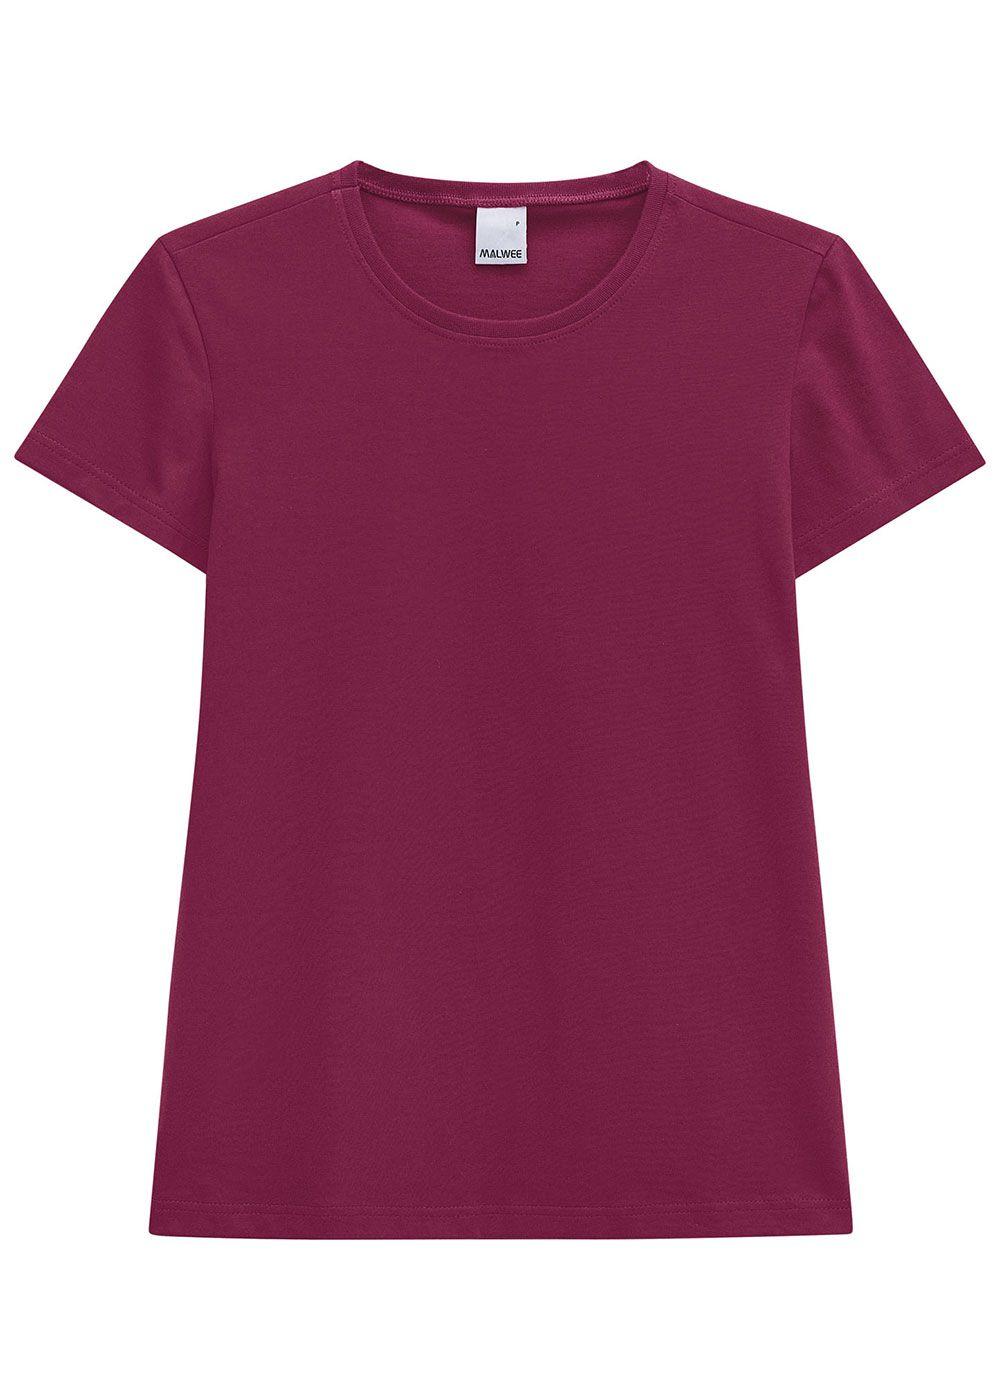 Blusa Feminina ADULTO Verão Vermelha Malwee